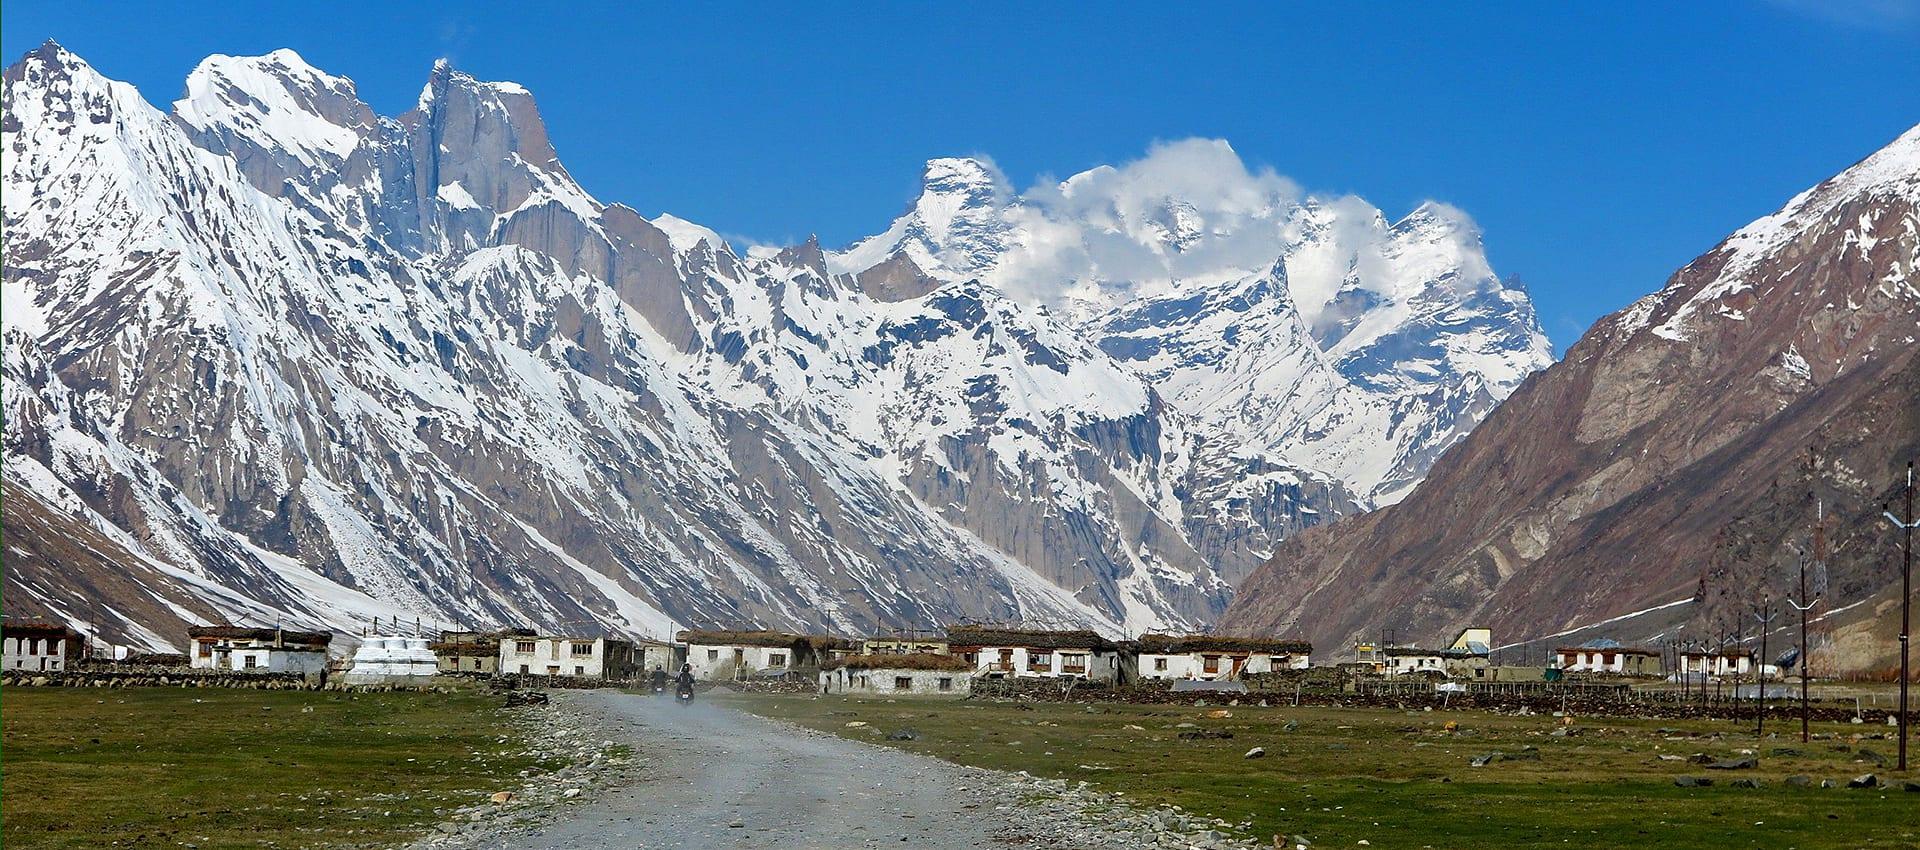 Motorreis Himalaya Zanskar Trail avontuurlijke motorreis in de herfst van de Himalaya voor de avontuurlijke motorrijder die geen last heeft van hoogtevrees